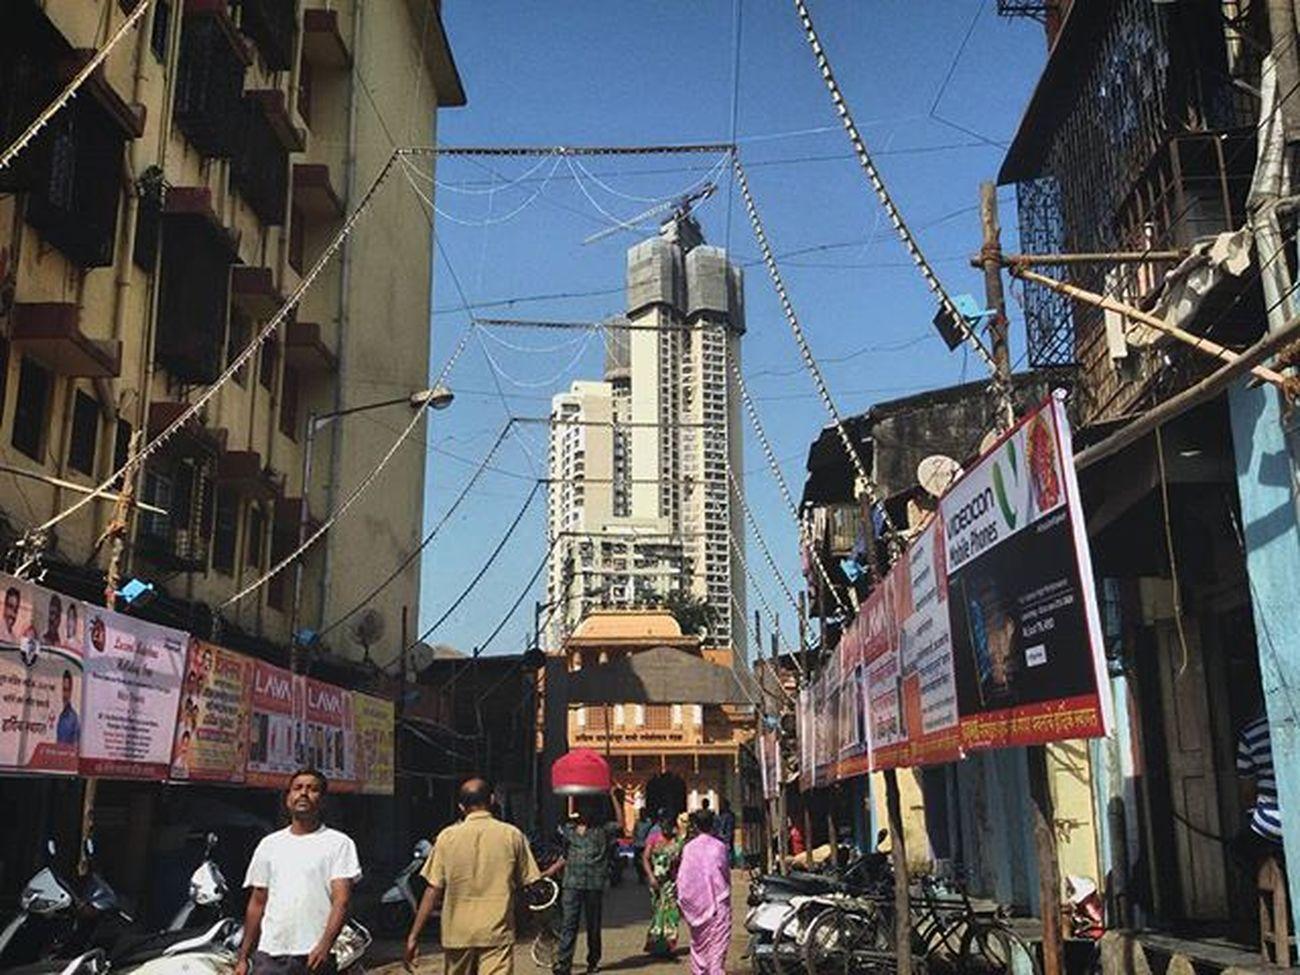 Mumbai.... D urban.... Place of Great building Mumbaikar Mumbai_uncensored Mumbai Mumbaibizarre Mumbaimerijaan Buildings Mumbaidairies Mobilephotography PhonePhotography Indian Indianphoto CameraMan Phonephoto Mobilecameraclub Mobile_perfection Mobilecamera Samsunggalaxygrand2 Streetphotography Streetphotographyindia @mumbai_explorer @my.mumbai @mumbai_stories @pixel_panda_ @things2doinmumbai @mumbai_igers @mumbai_igers @itz_mumbai @streets.of.mumbai Maharshtra Maharashtra_ig Insta_maharashtra Maharashtratourism Indianinstagram Indianphotographers indianphotographersclub